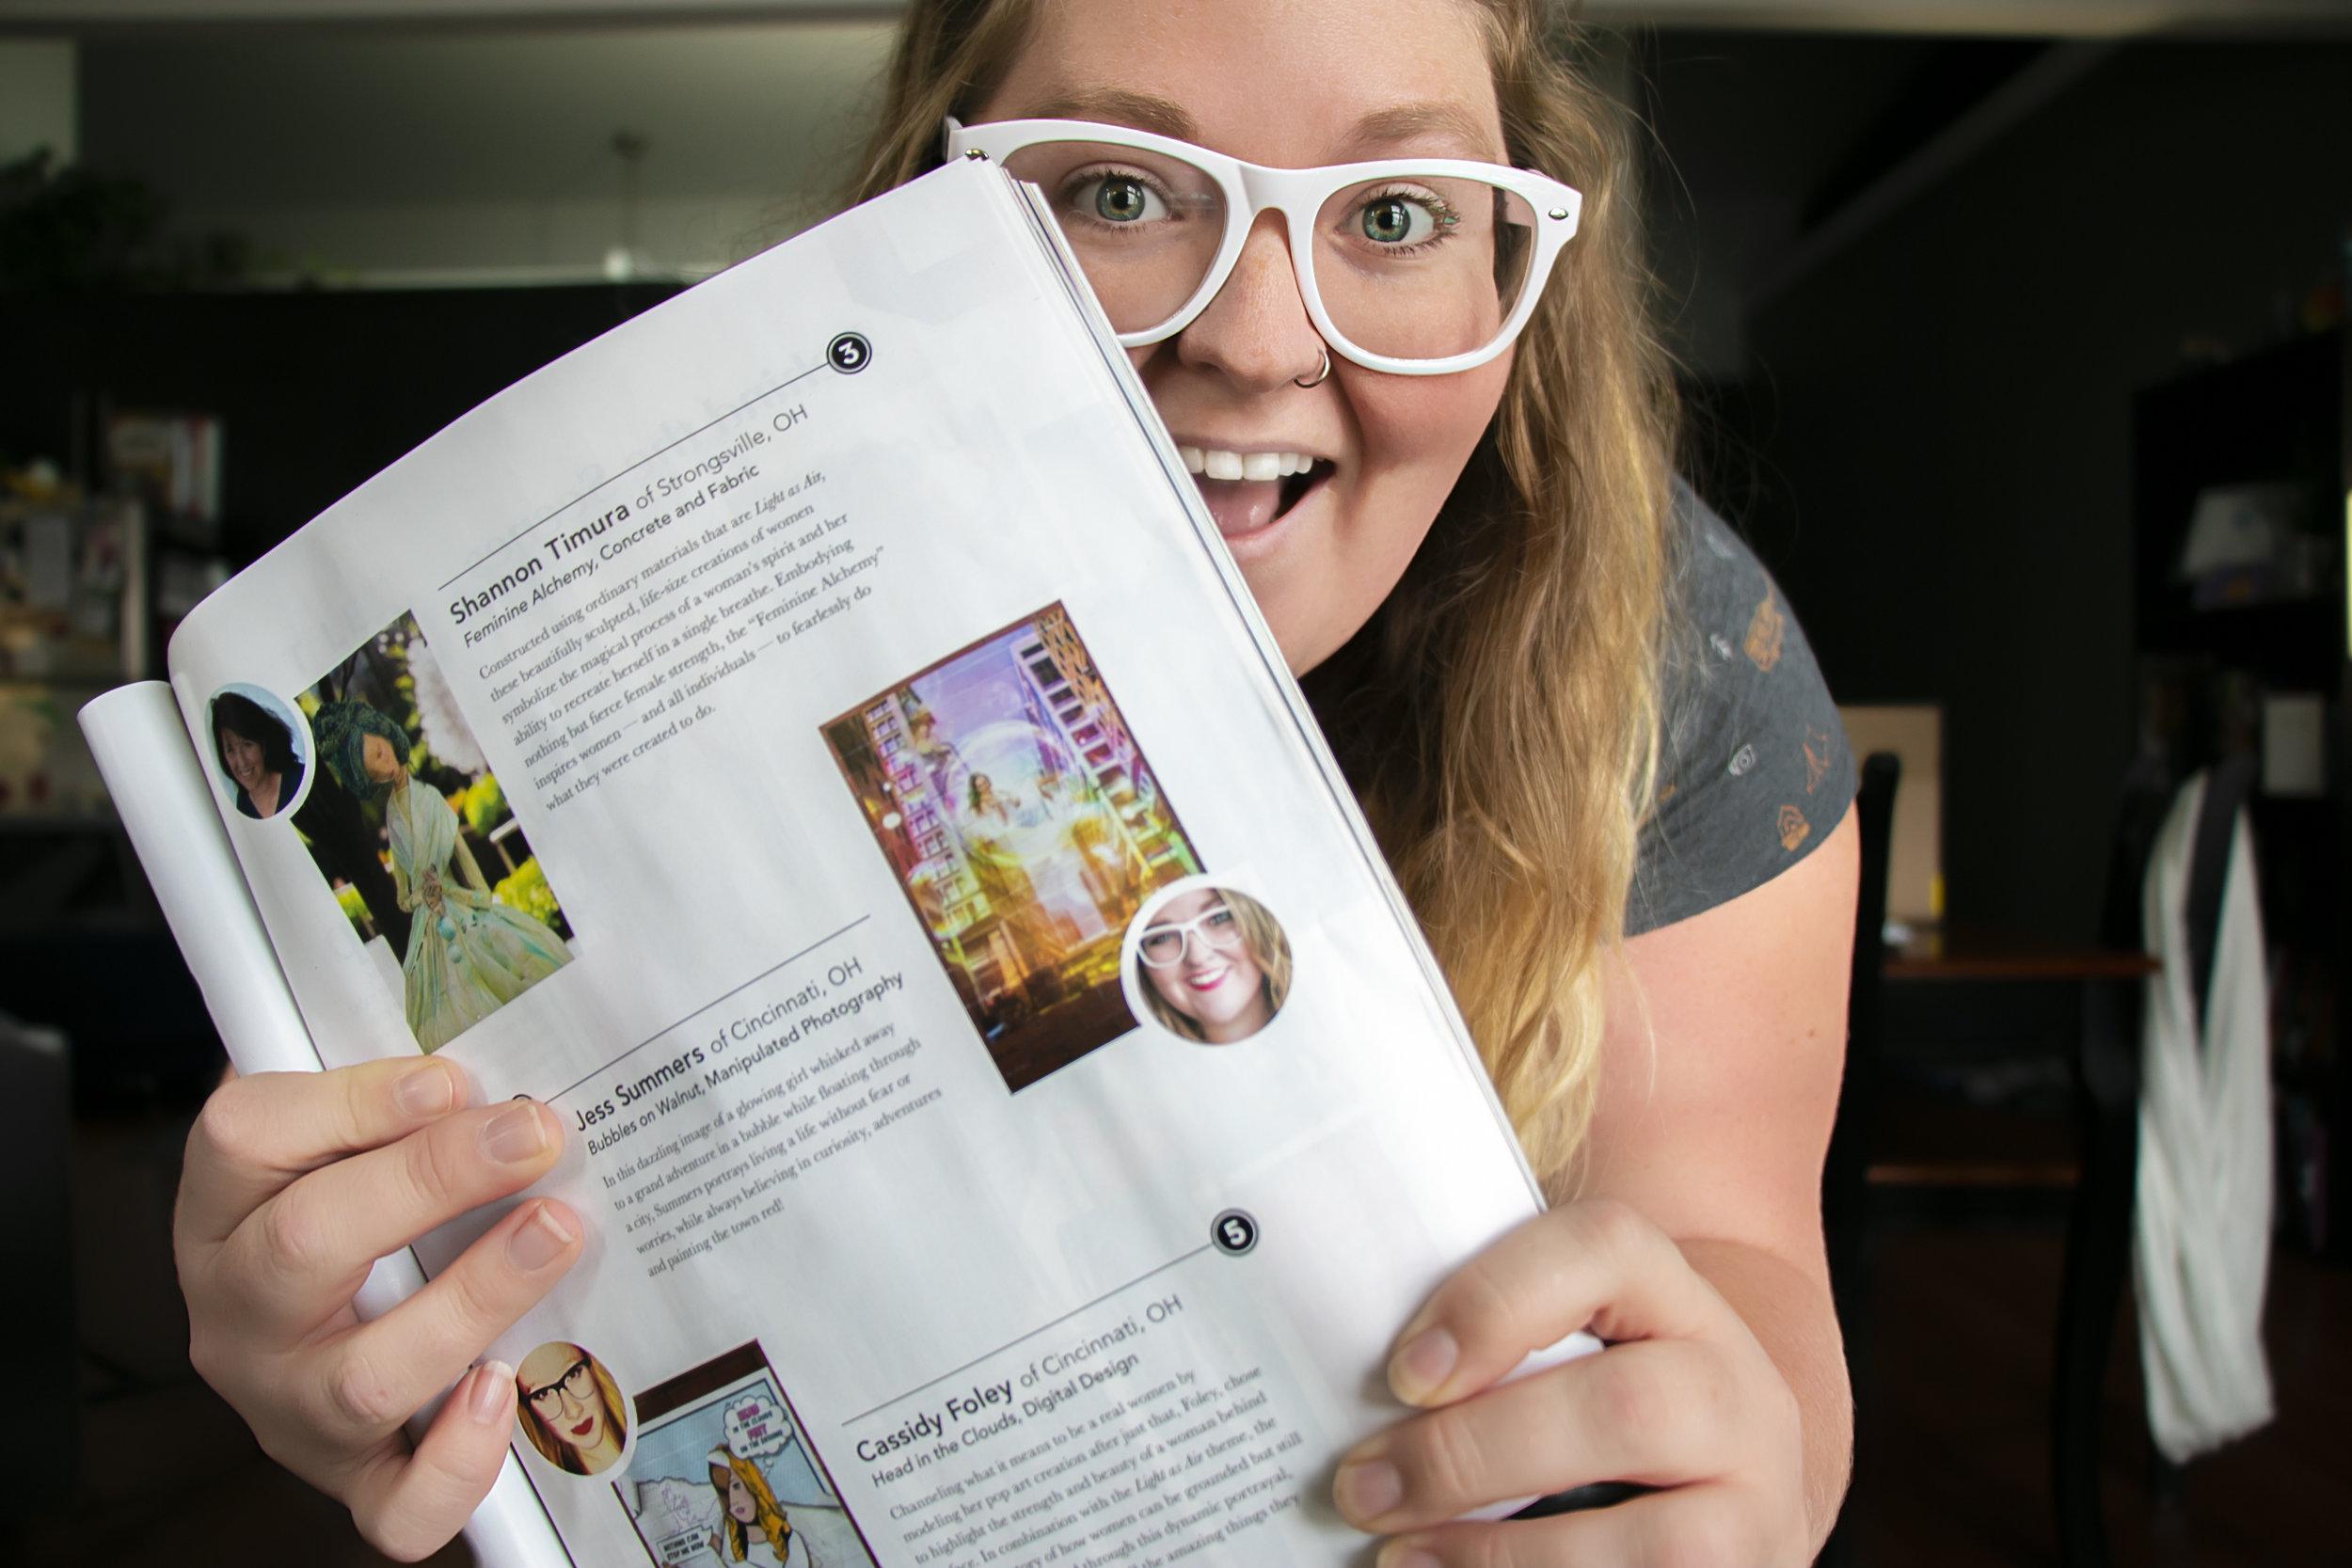 Jess-Summers-of-Say-yes-to-jess-in-Oprah-Magazine-Cincinnati-ohio-Photographer.jpg